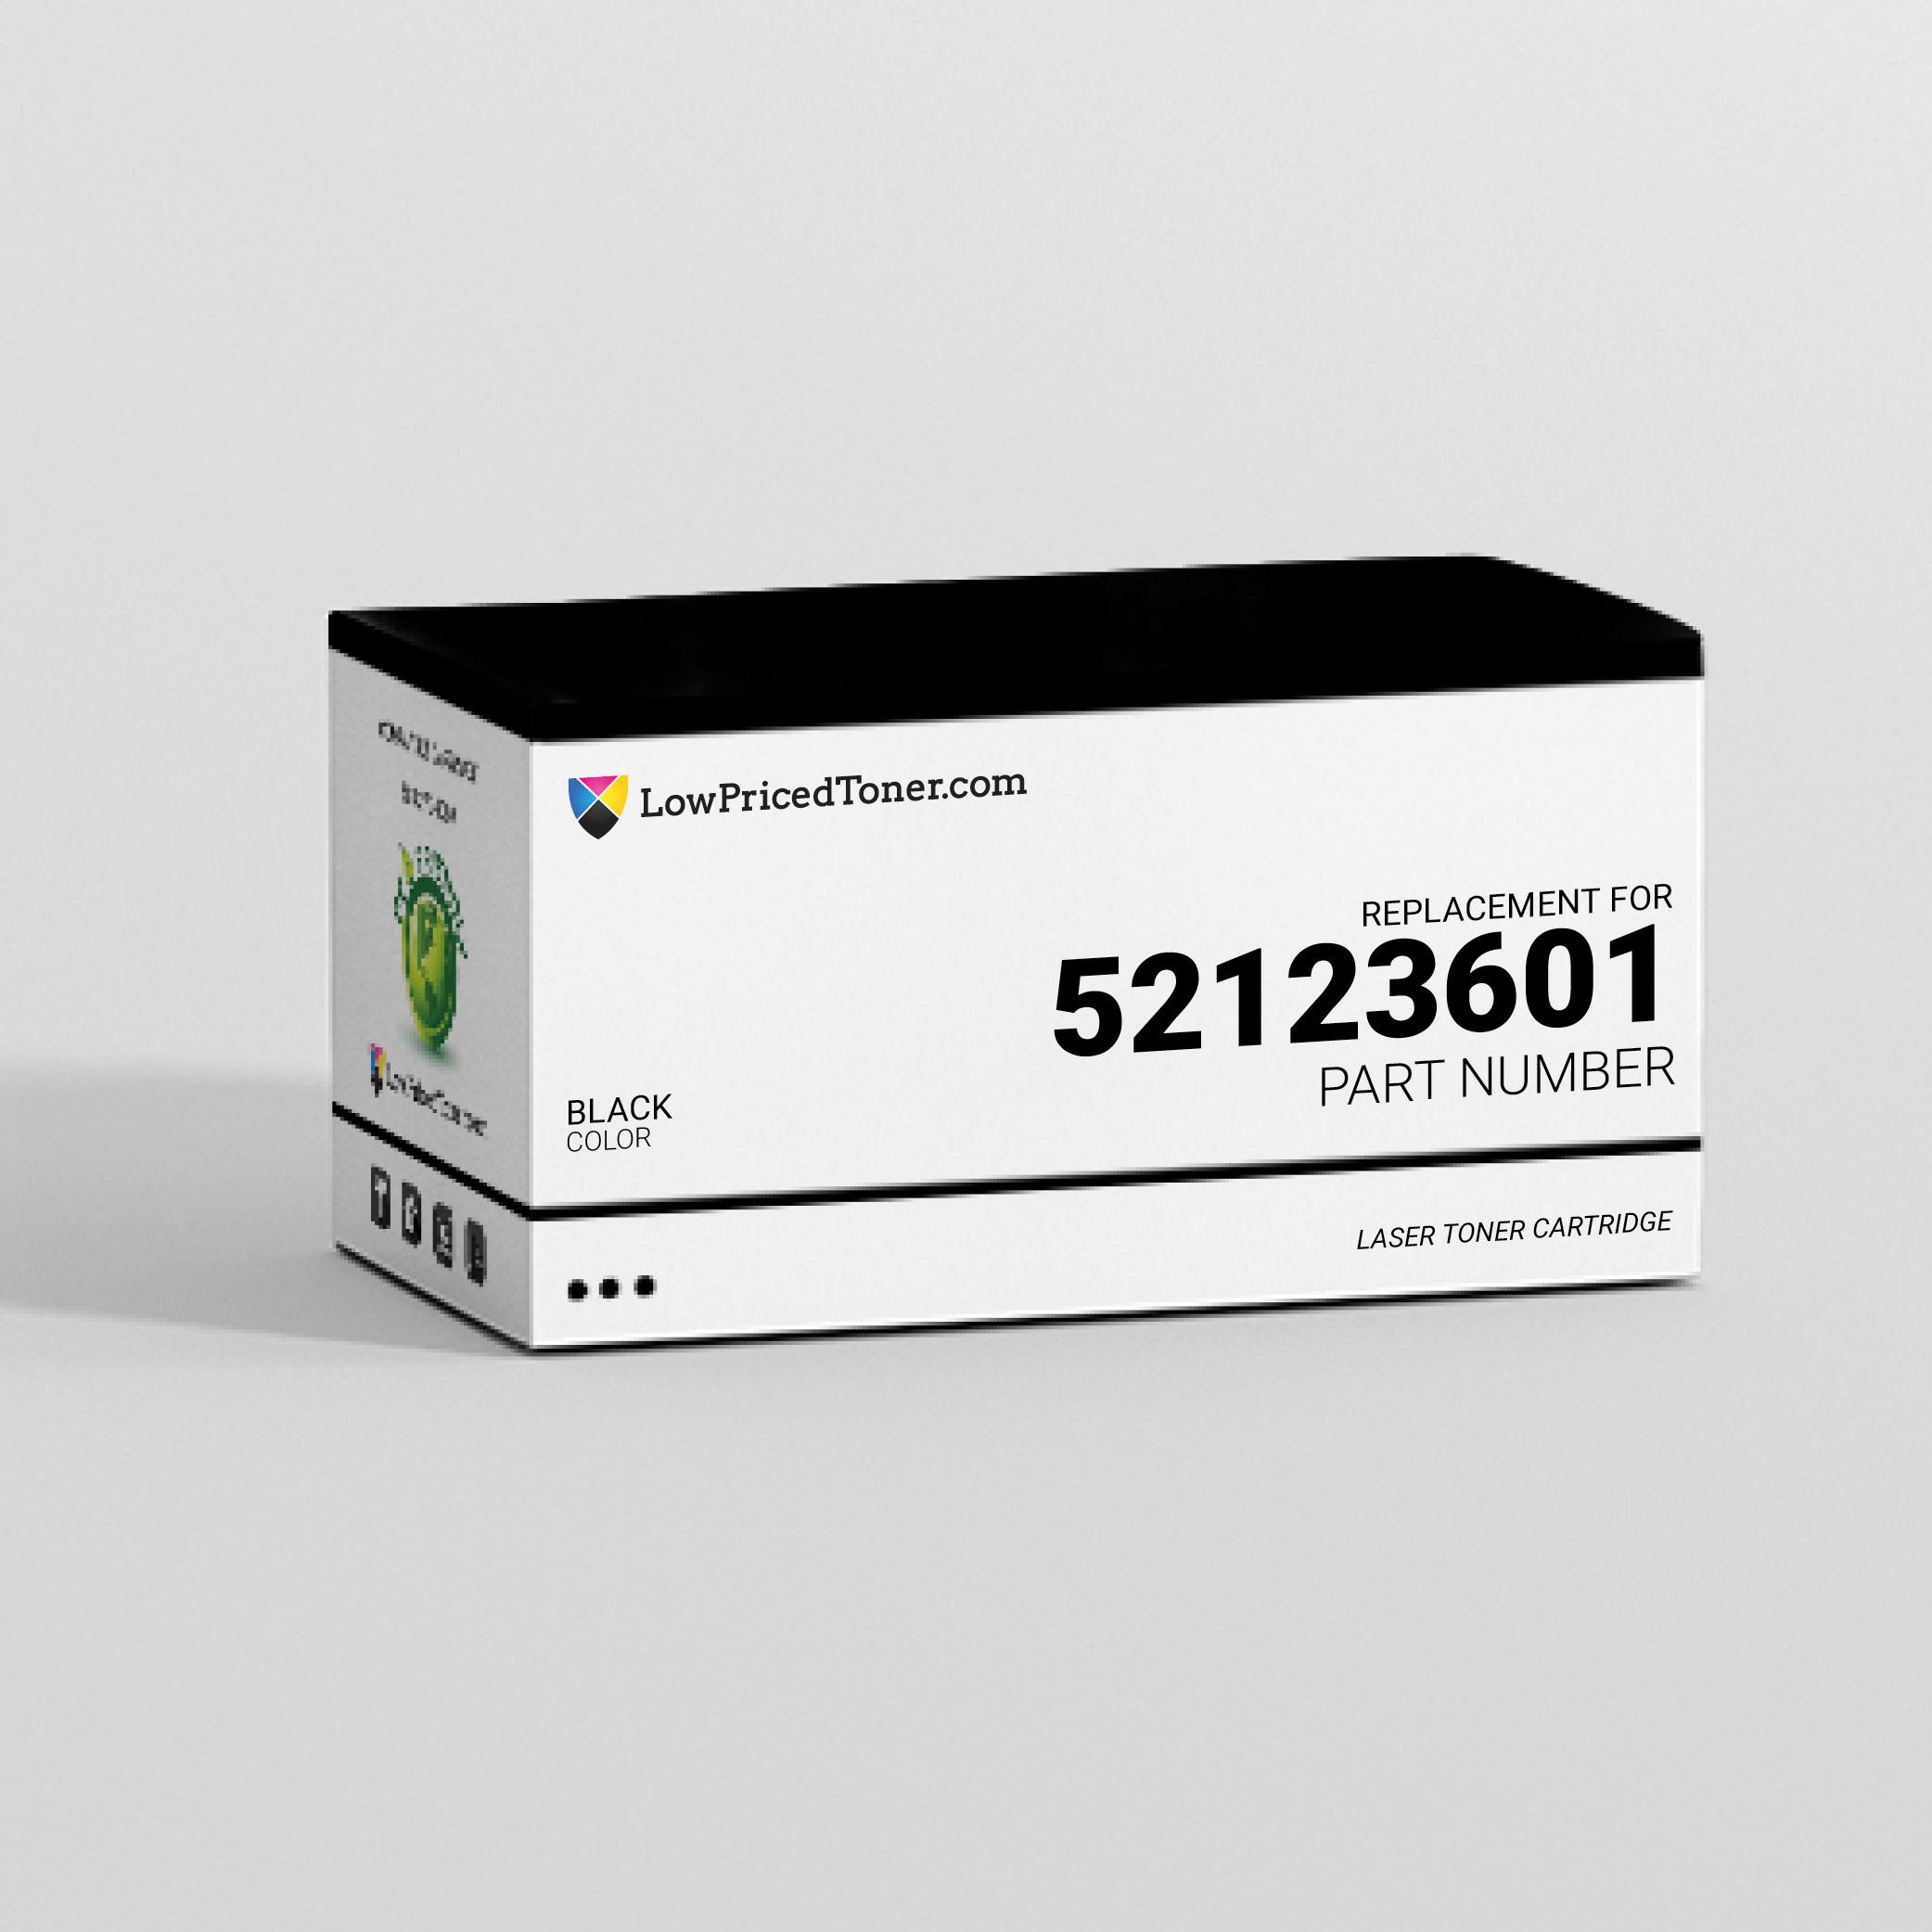 Okidata 52123601 Compatible Black Laser Toner Cartridge